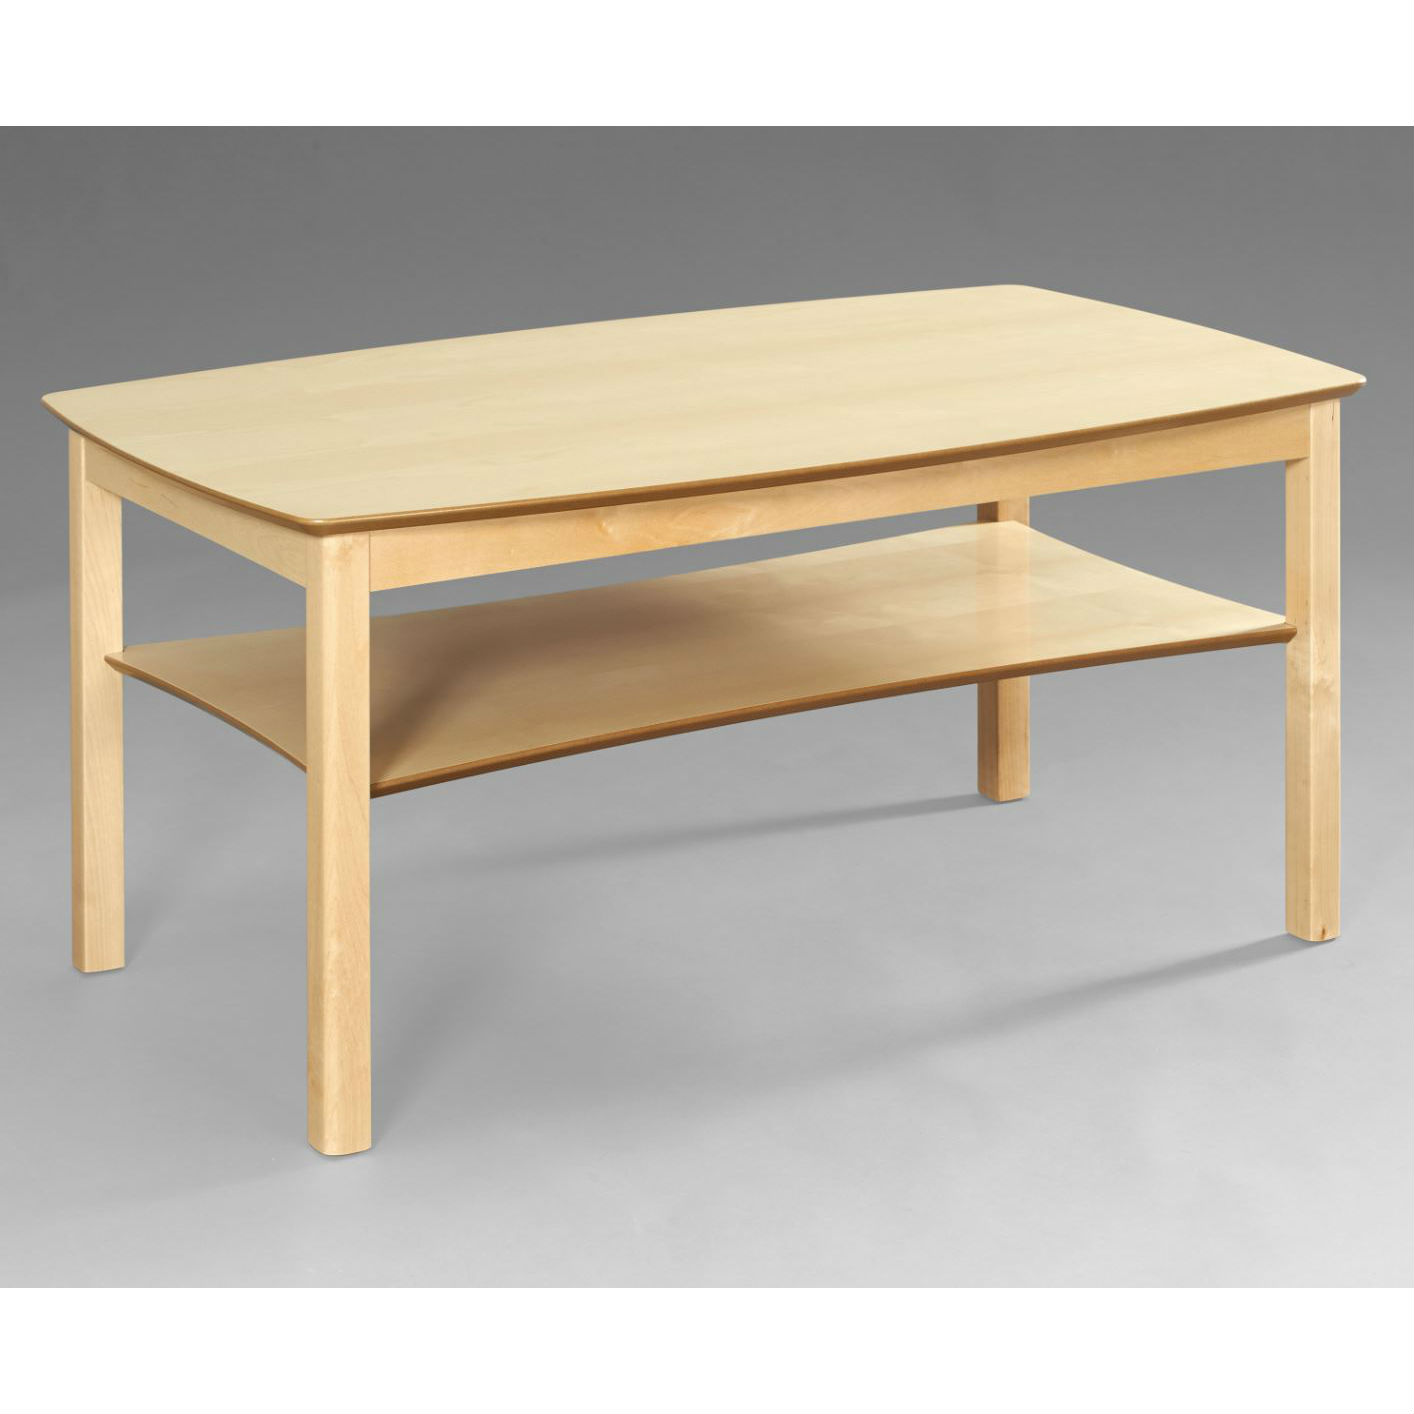 Soffbord DISTANS 120 Tofta Möbel AB